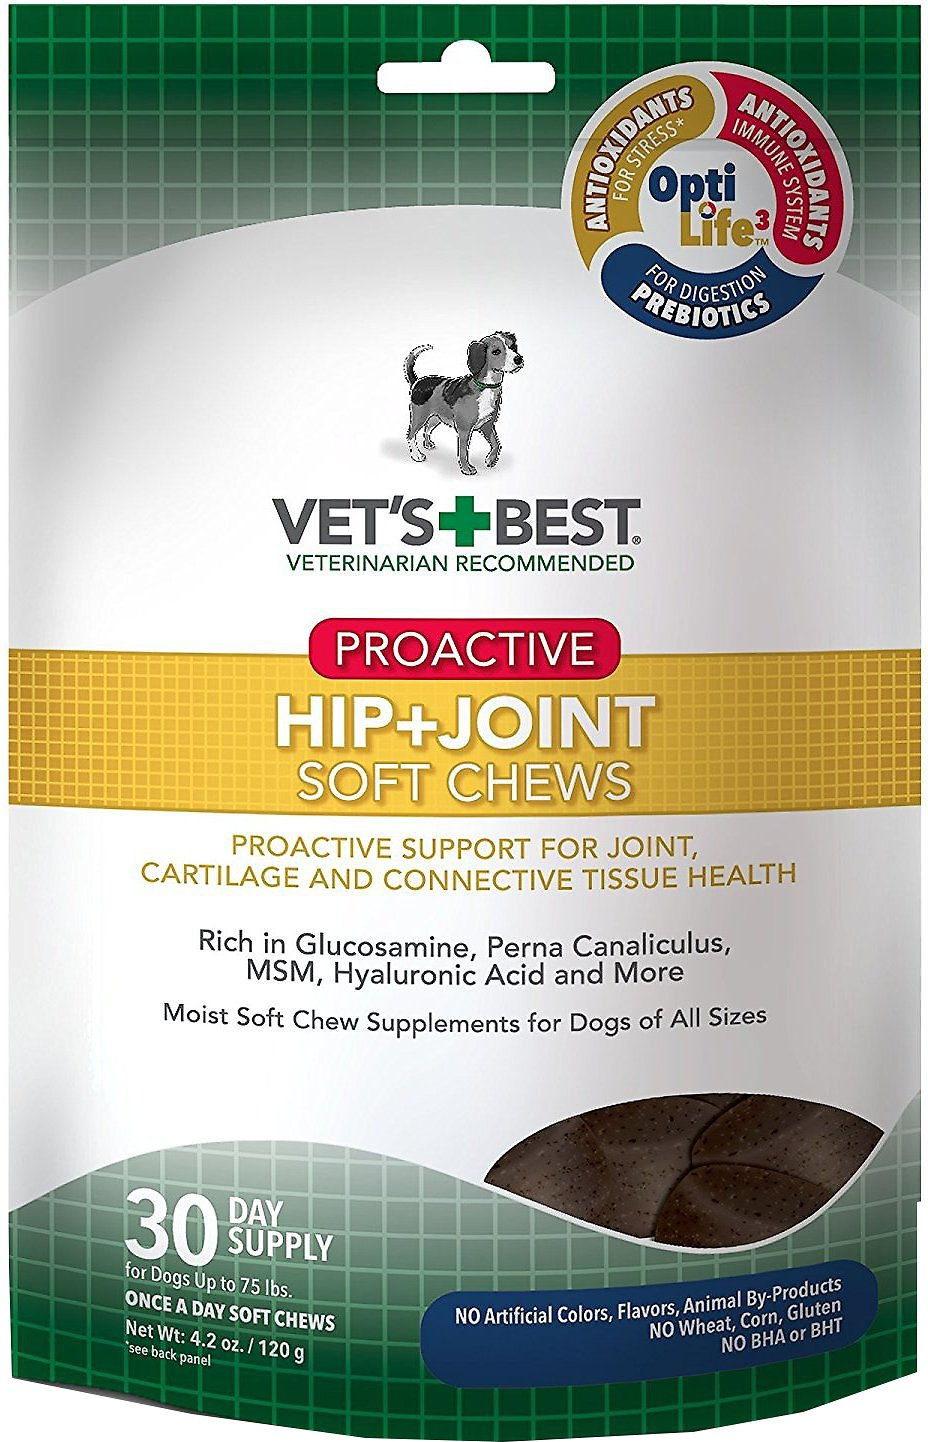 Vet's Best Proactive Hip + Joint Soft Chews Dog Supplement, 30 count